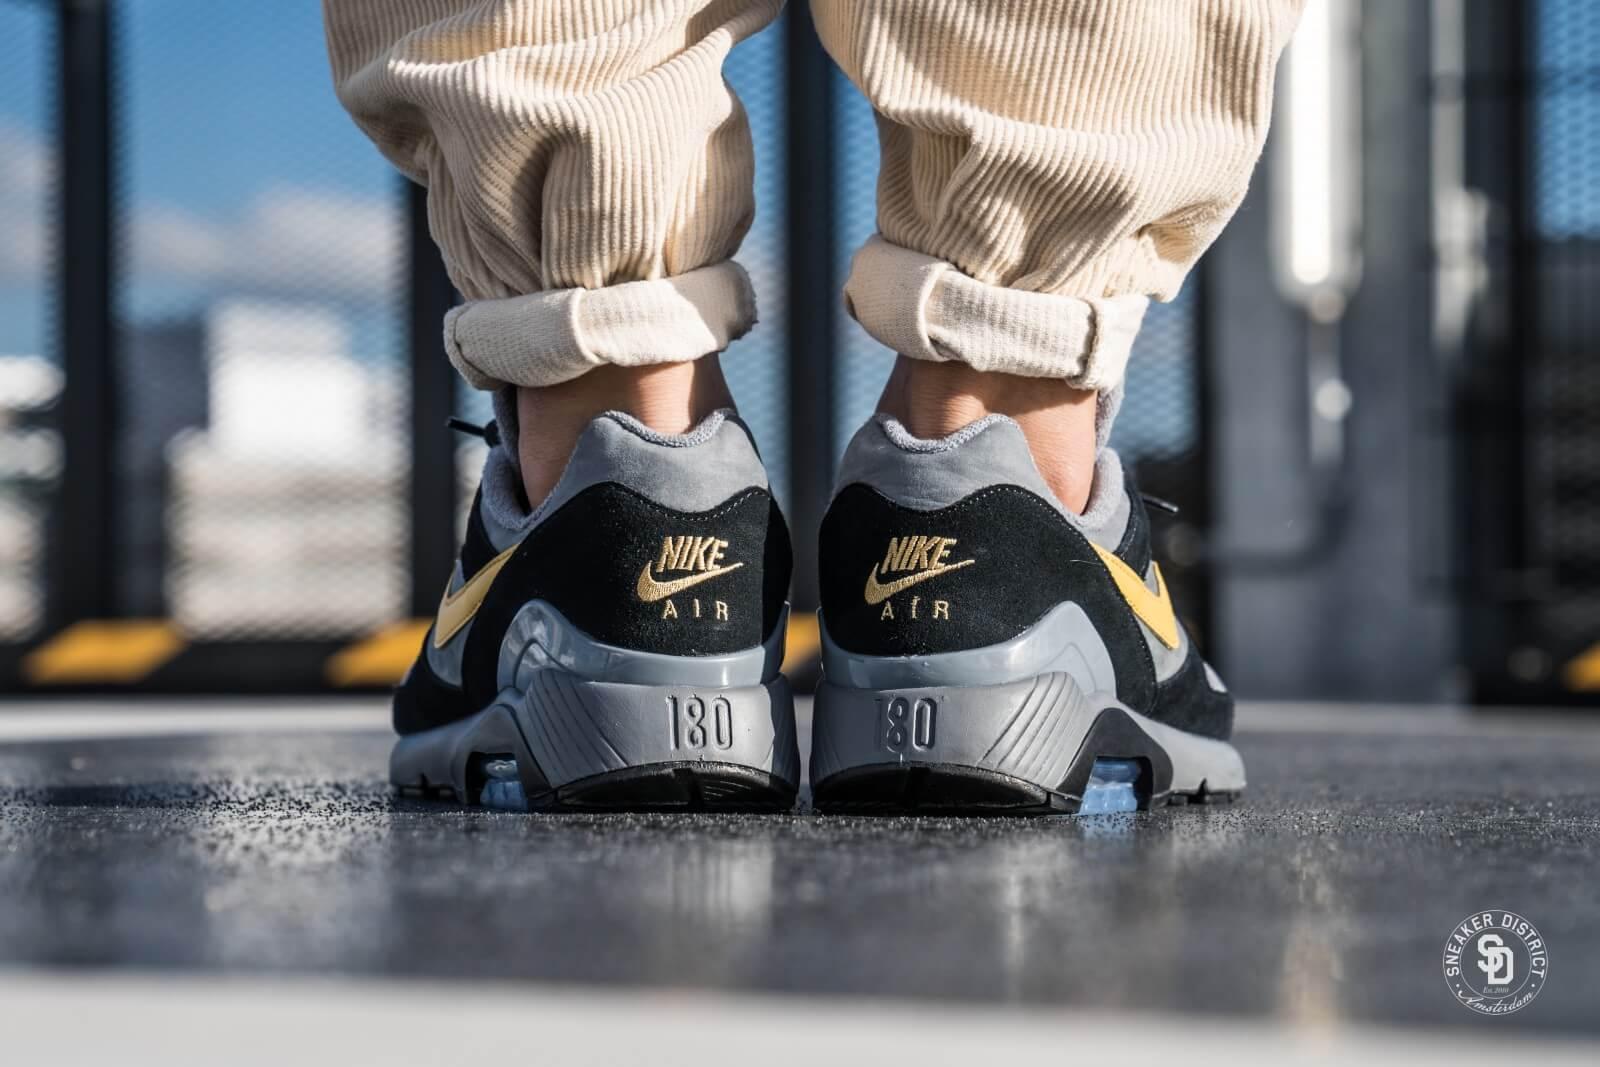 Nike Air Max 180 Cool Grey/Wheat Gold-Black